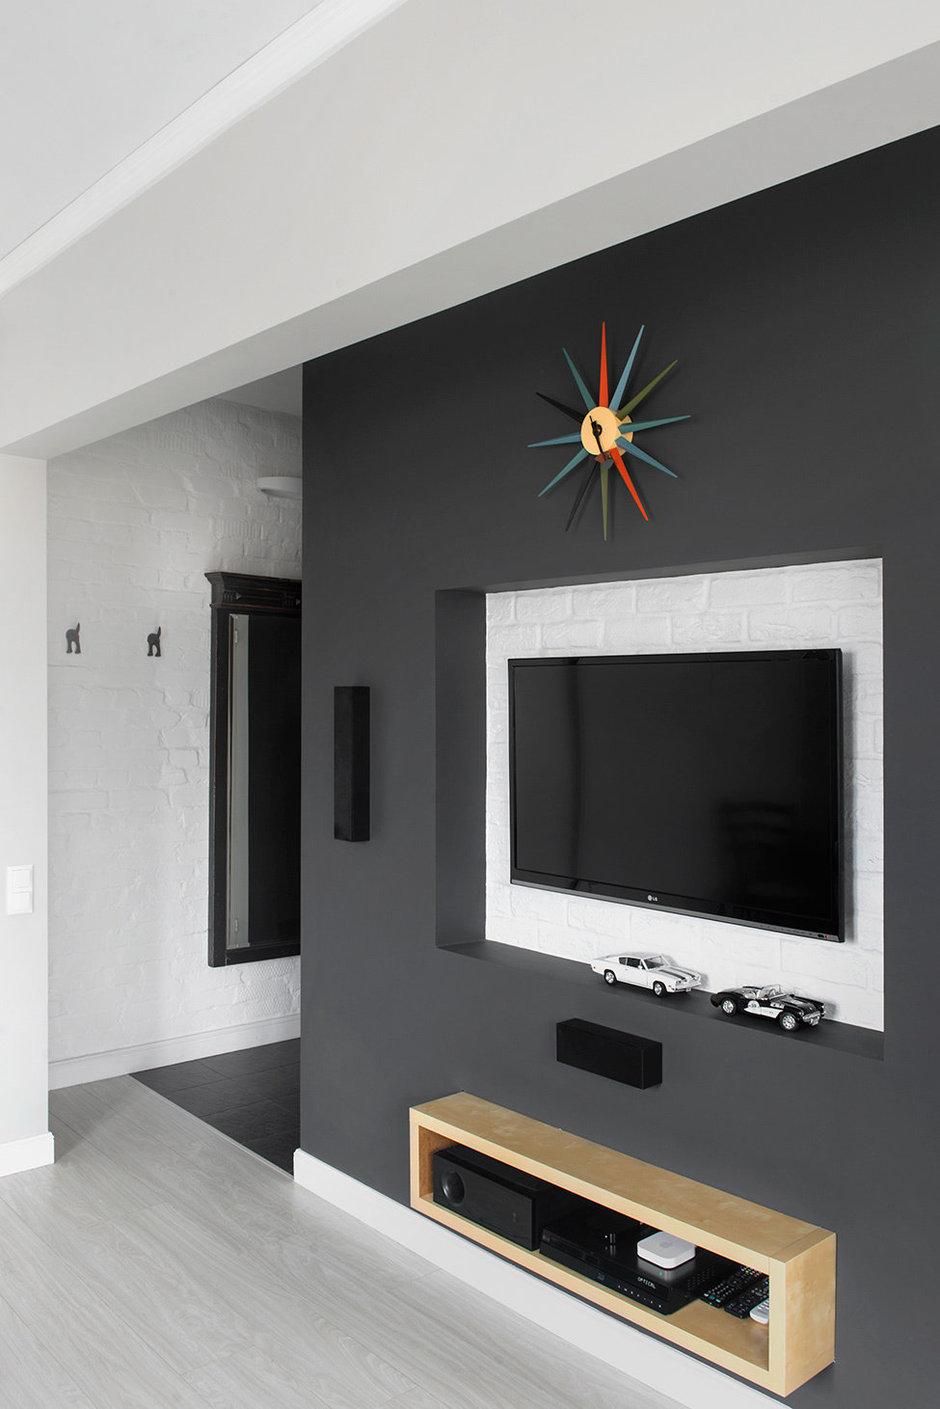 Фотография: Декор в стиле Современный, Малогабаритная квартира, Квартира, Дома и квартиры, IKEA, Проект недели, Хрущевка – фото на InMyRoom.ru